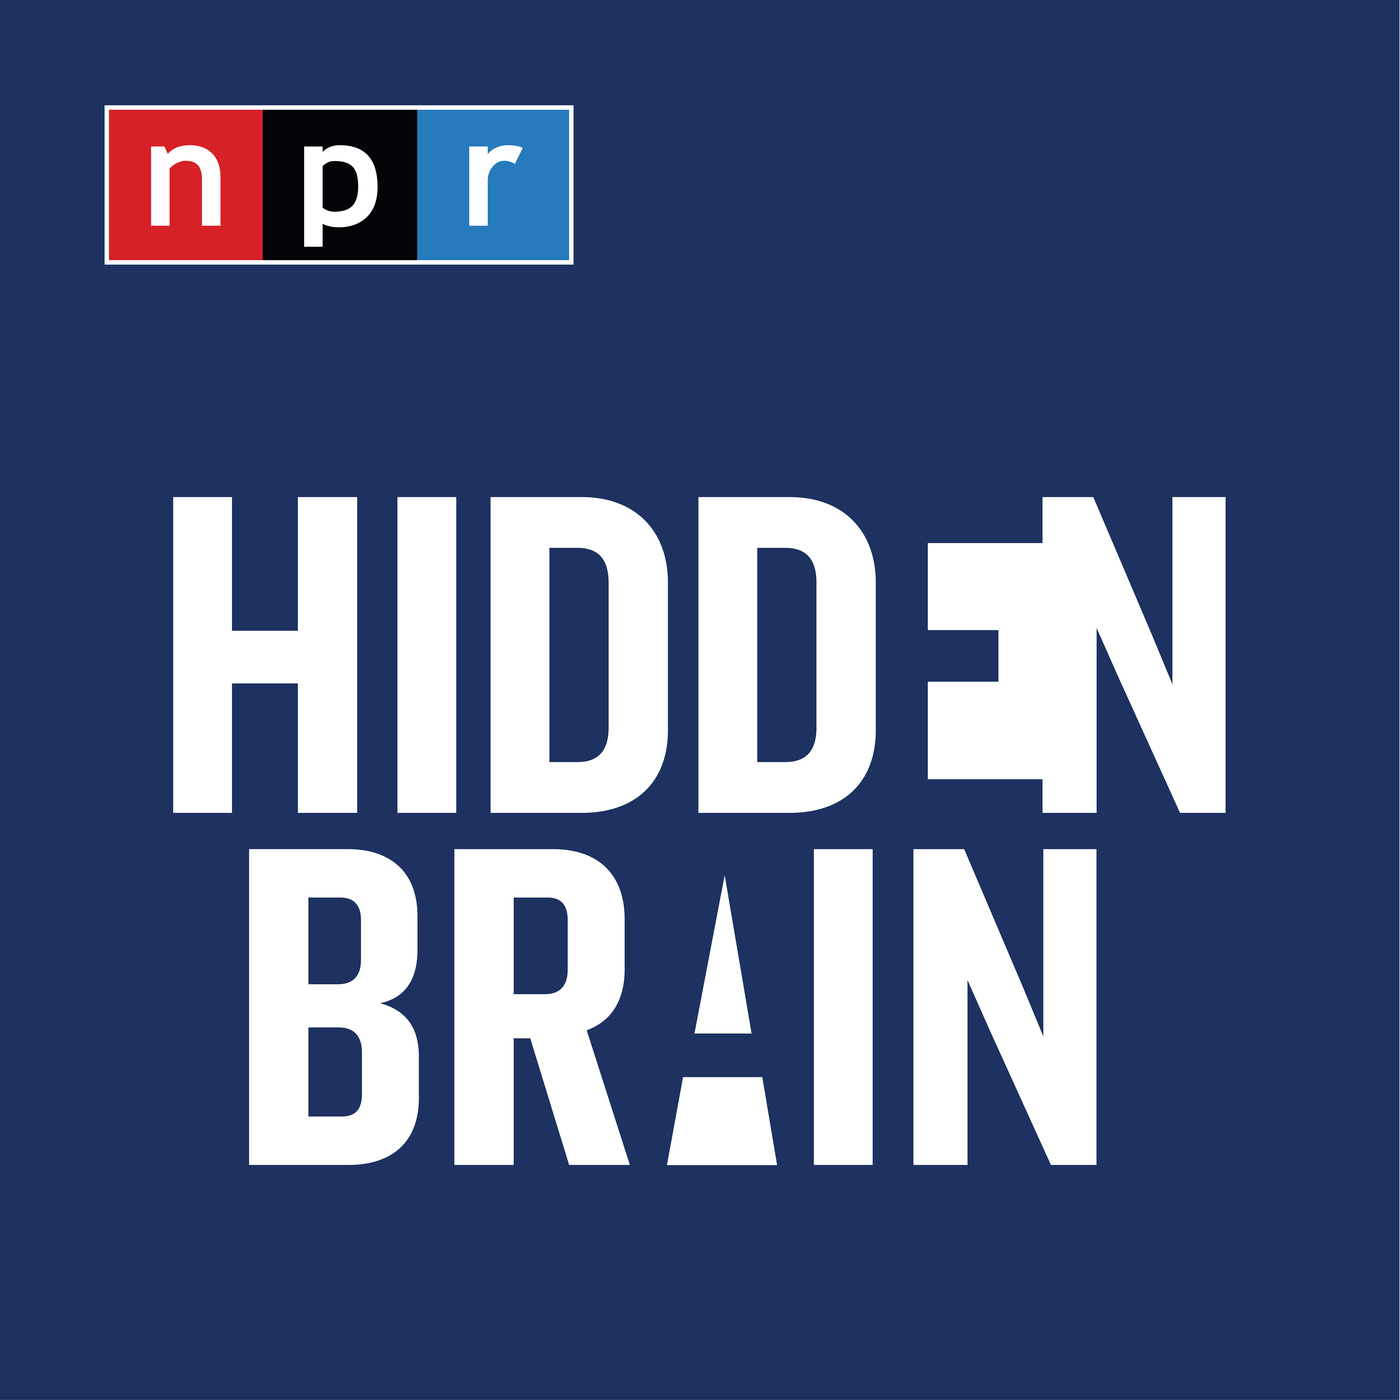 npr_hiddenbrain_podcasttile